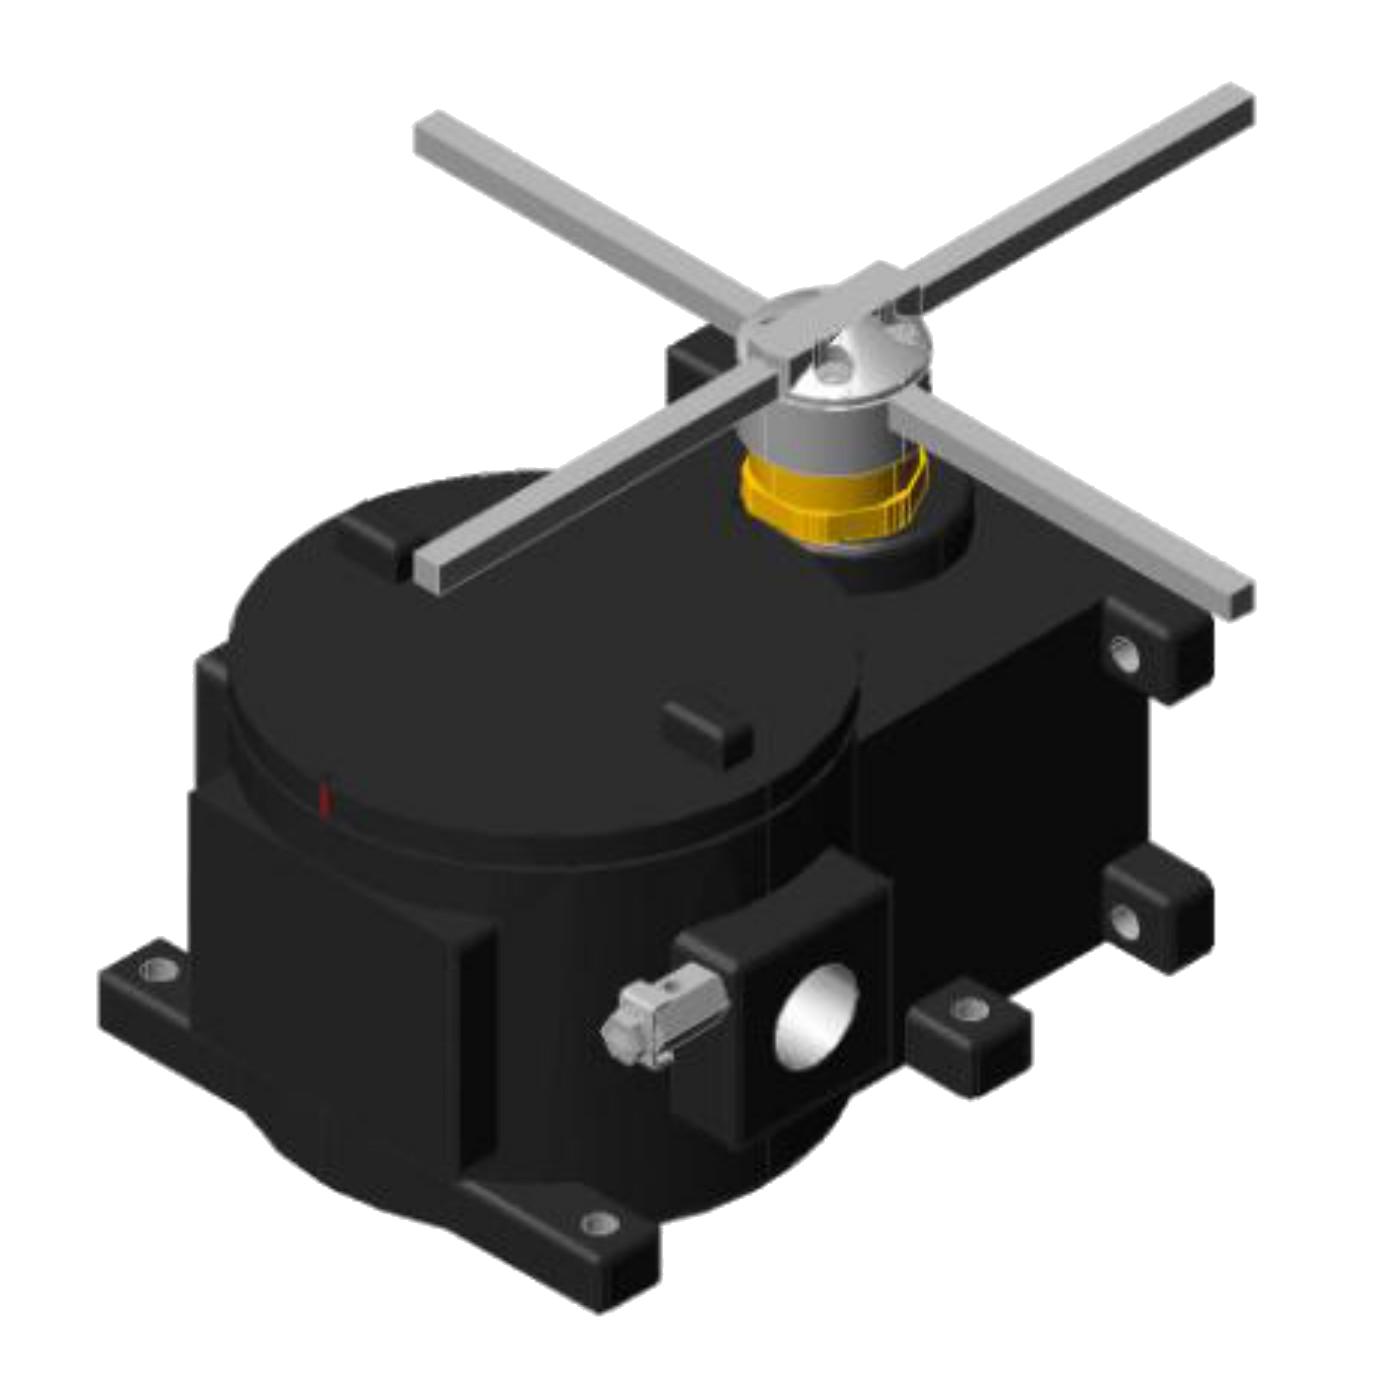 Position Limit Switches For Hazardous Areas